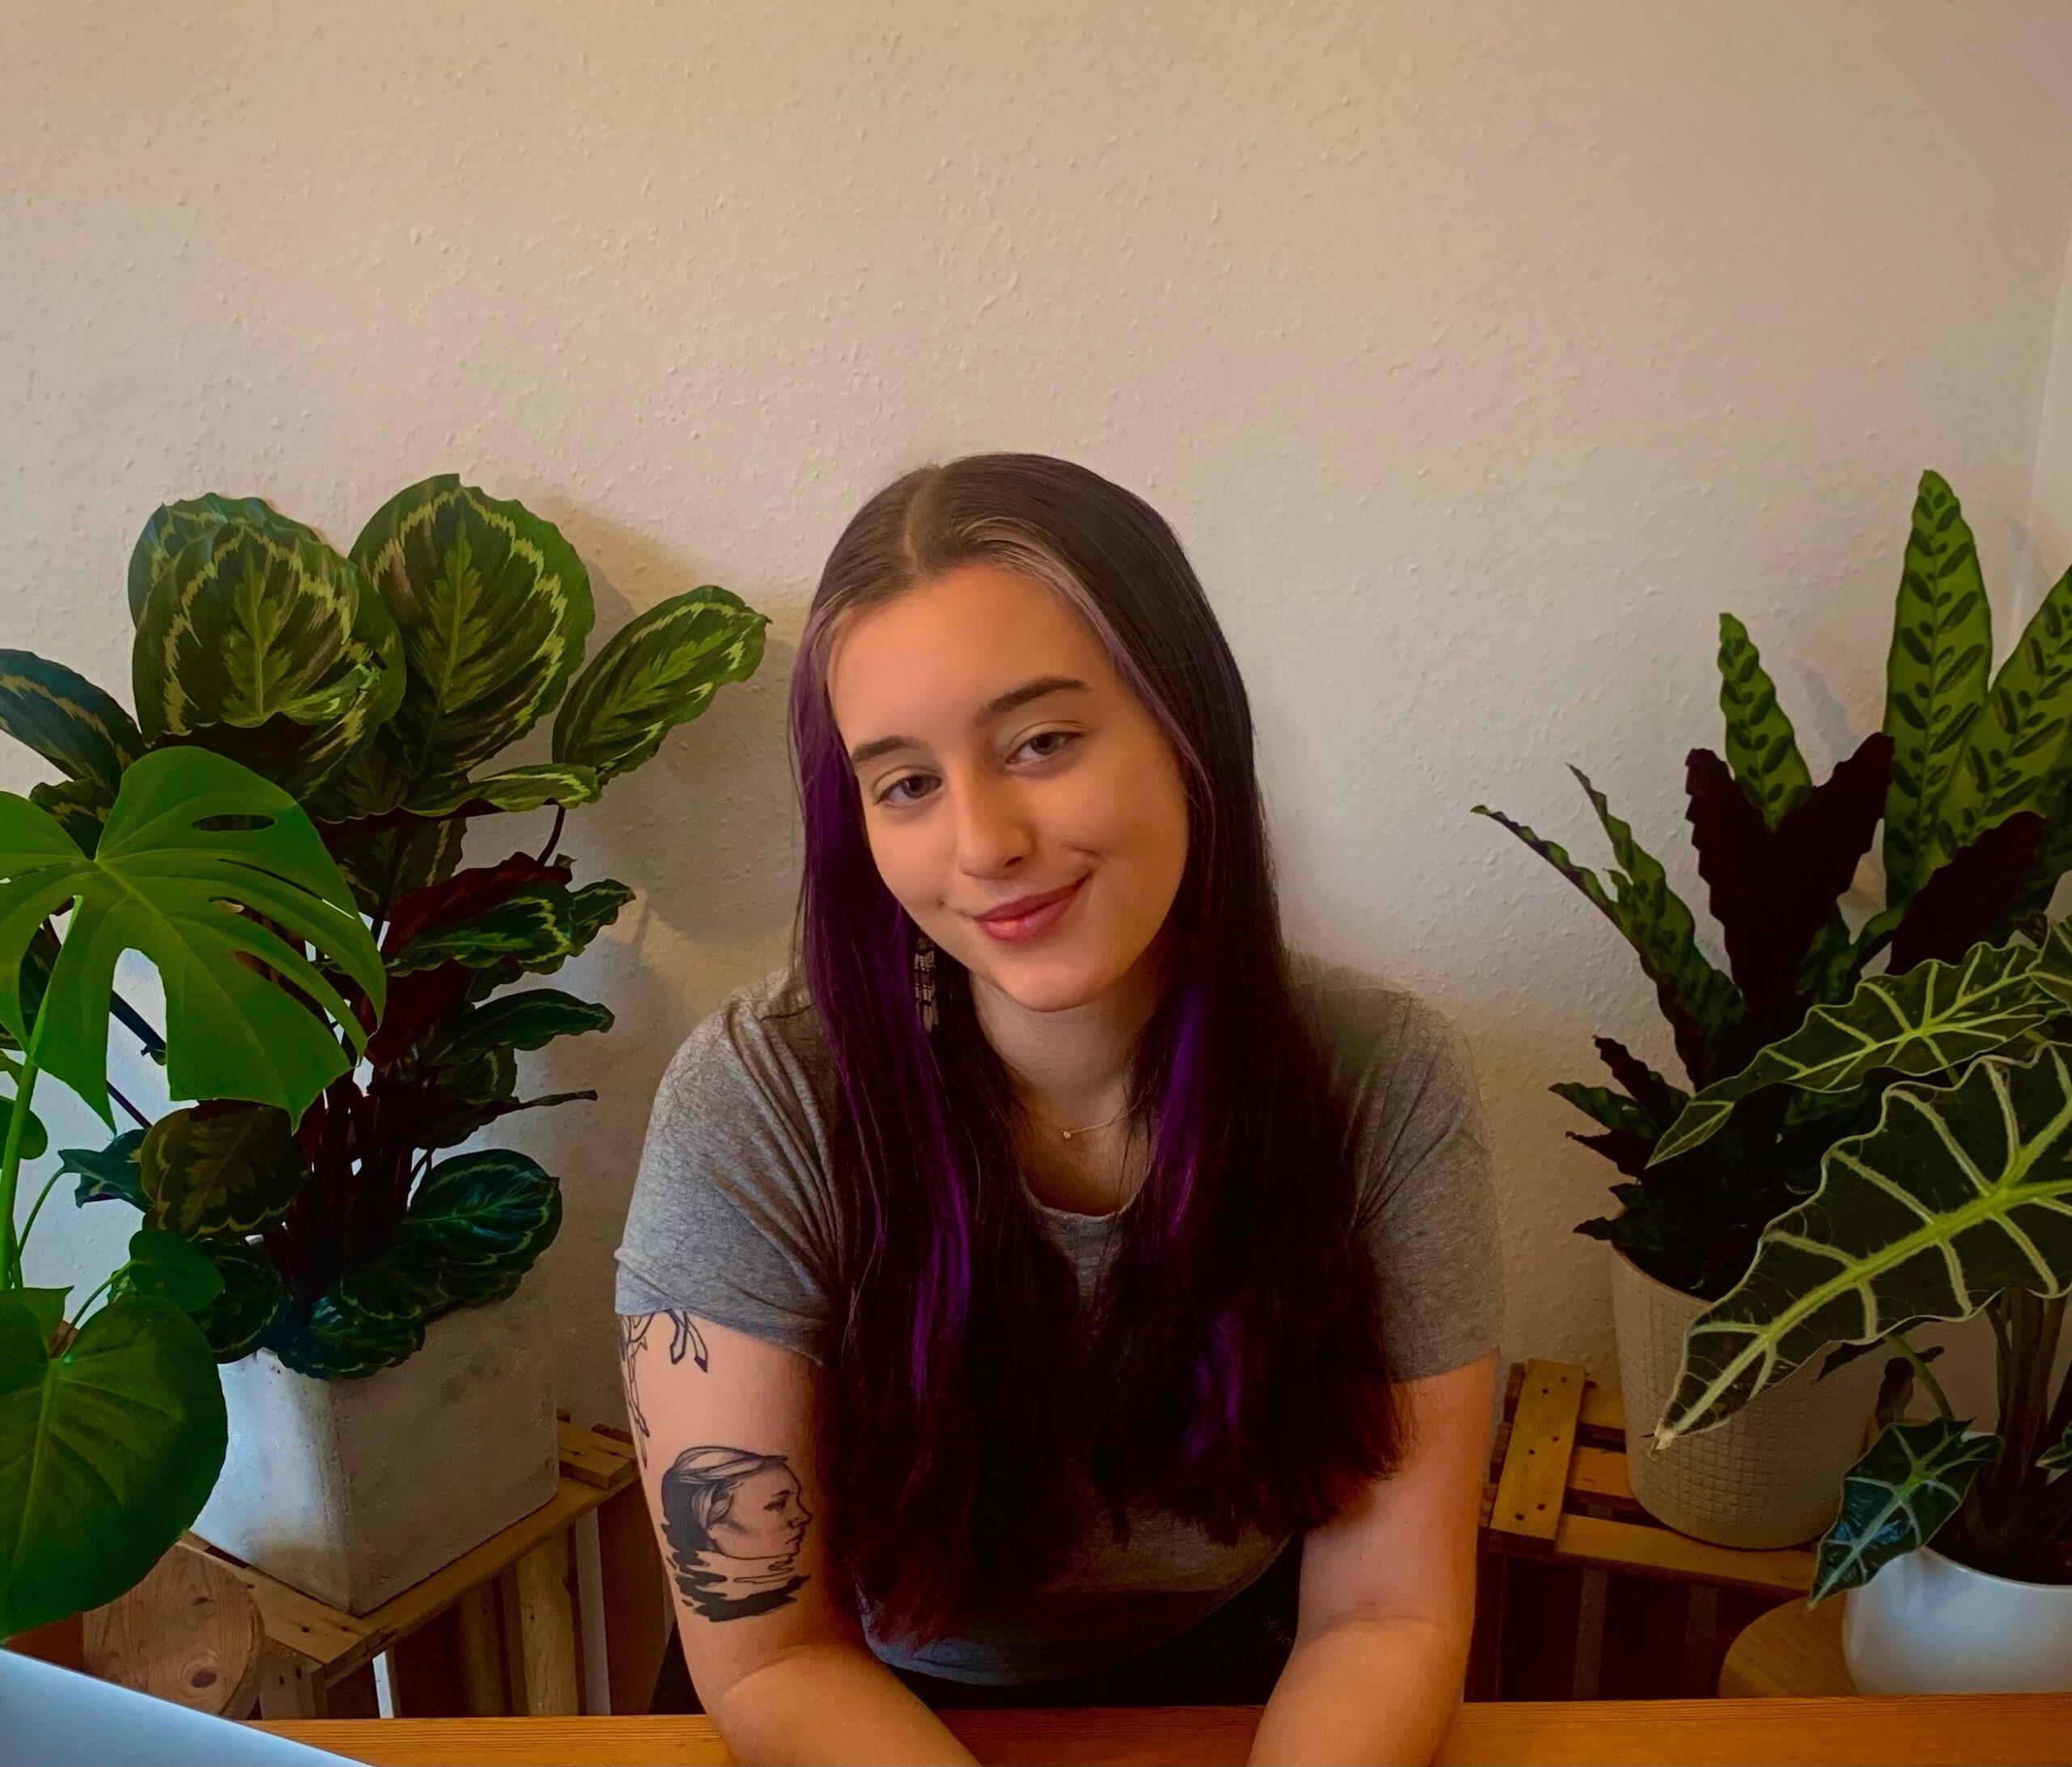 Photograph of Gillian Joseph